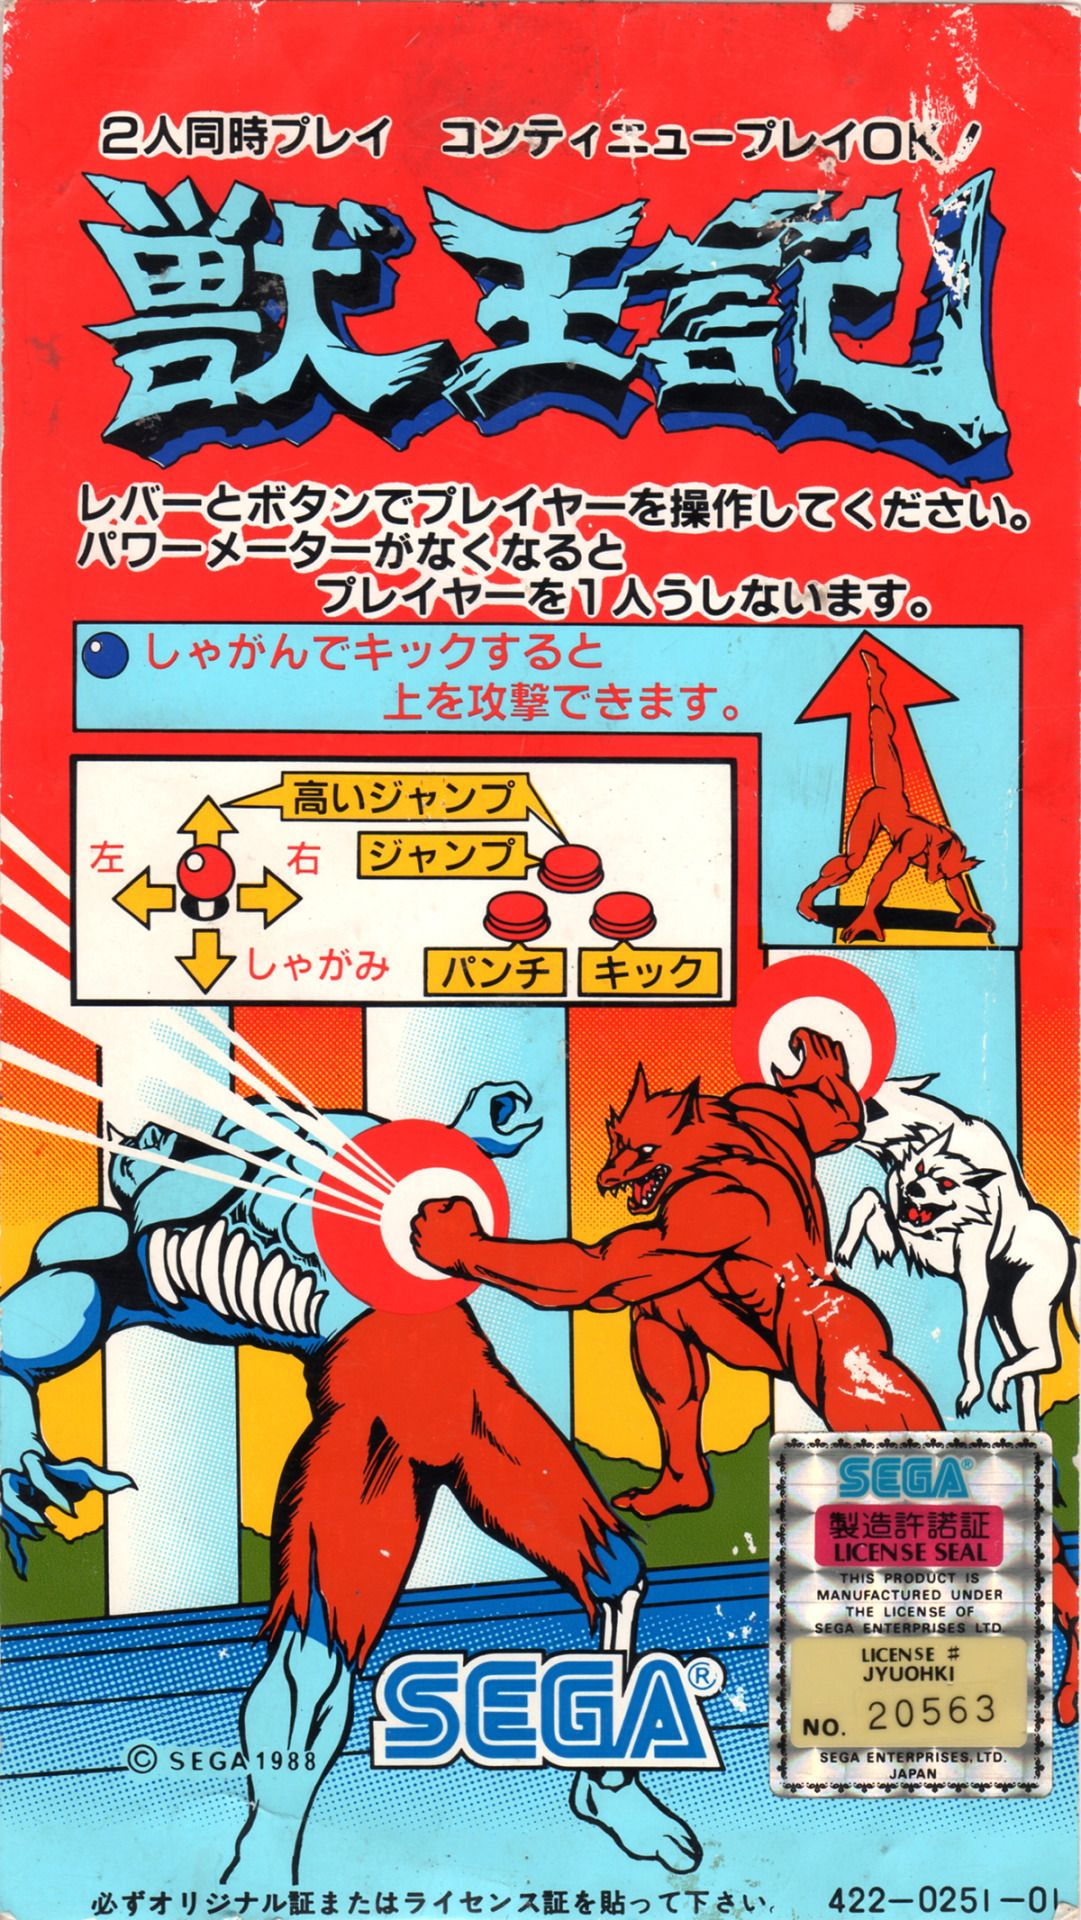 Arcade, Jukeboxes & Pinball Manuals & Guides Japanese Strike Fighter Sega Original Arcade Game Owners Manual Aesthetic Appearance